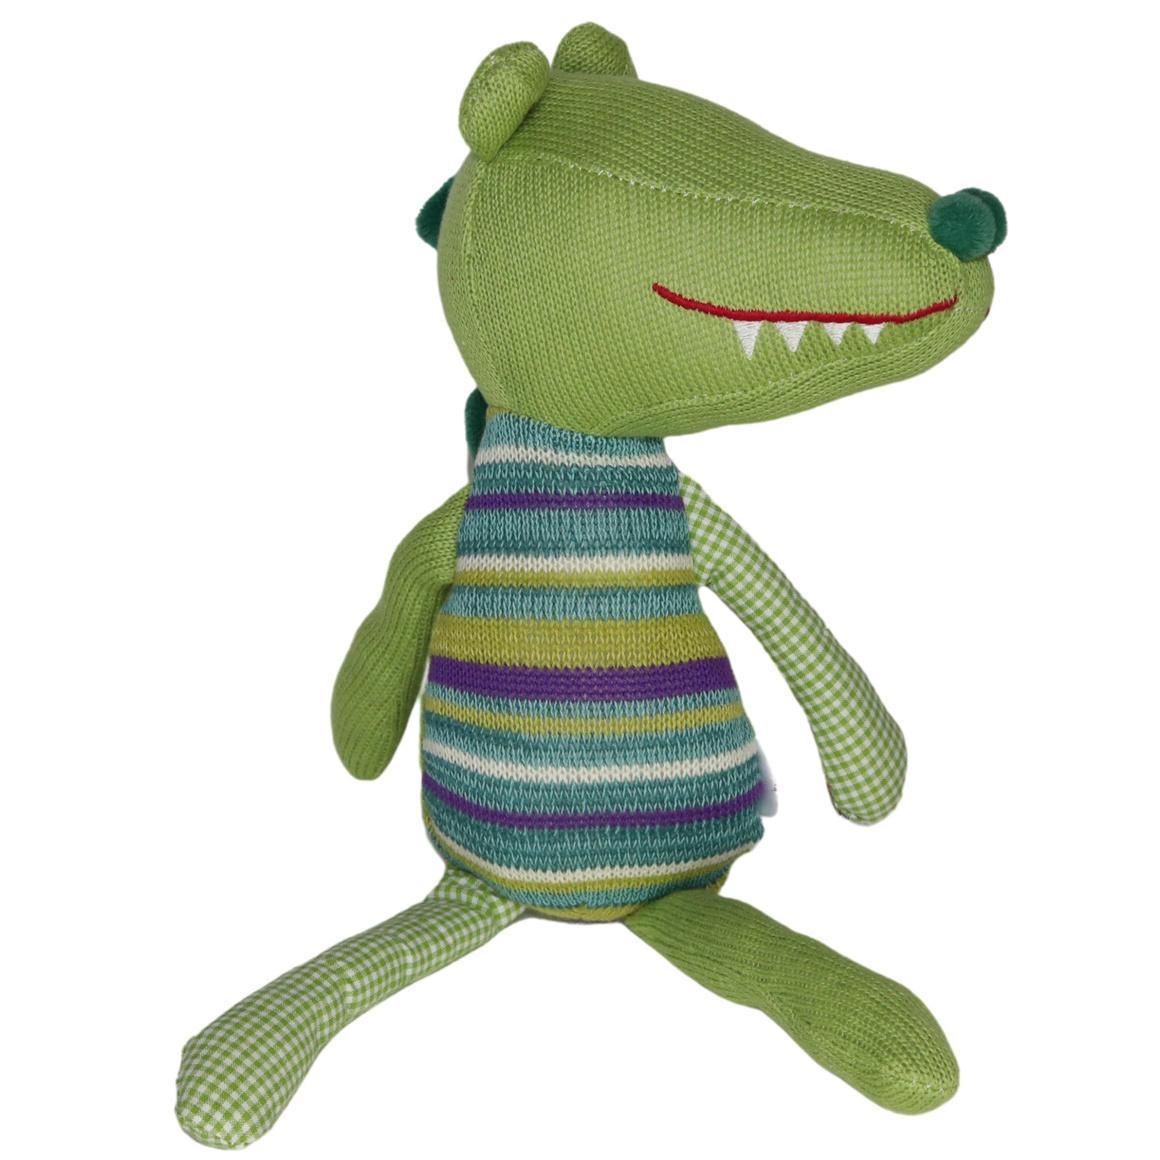 Plush Toy Crocodile - Green/Stripe   Trada Marketplace